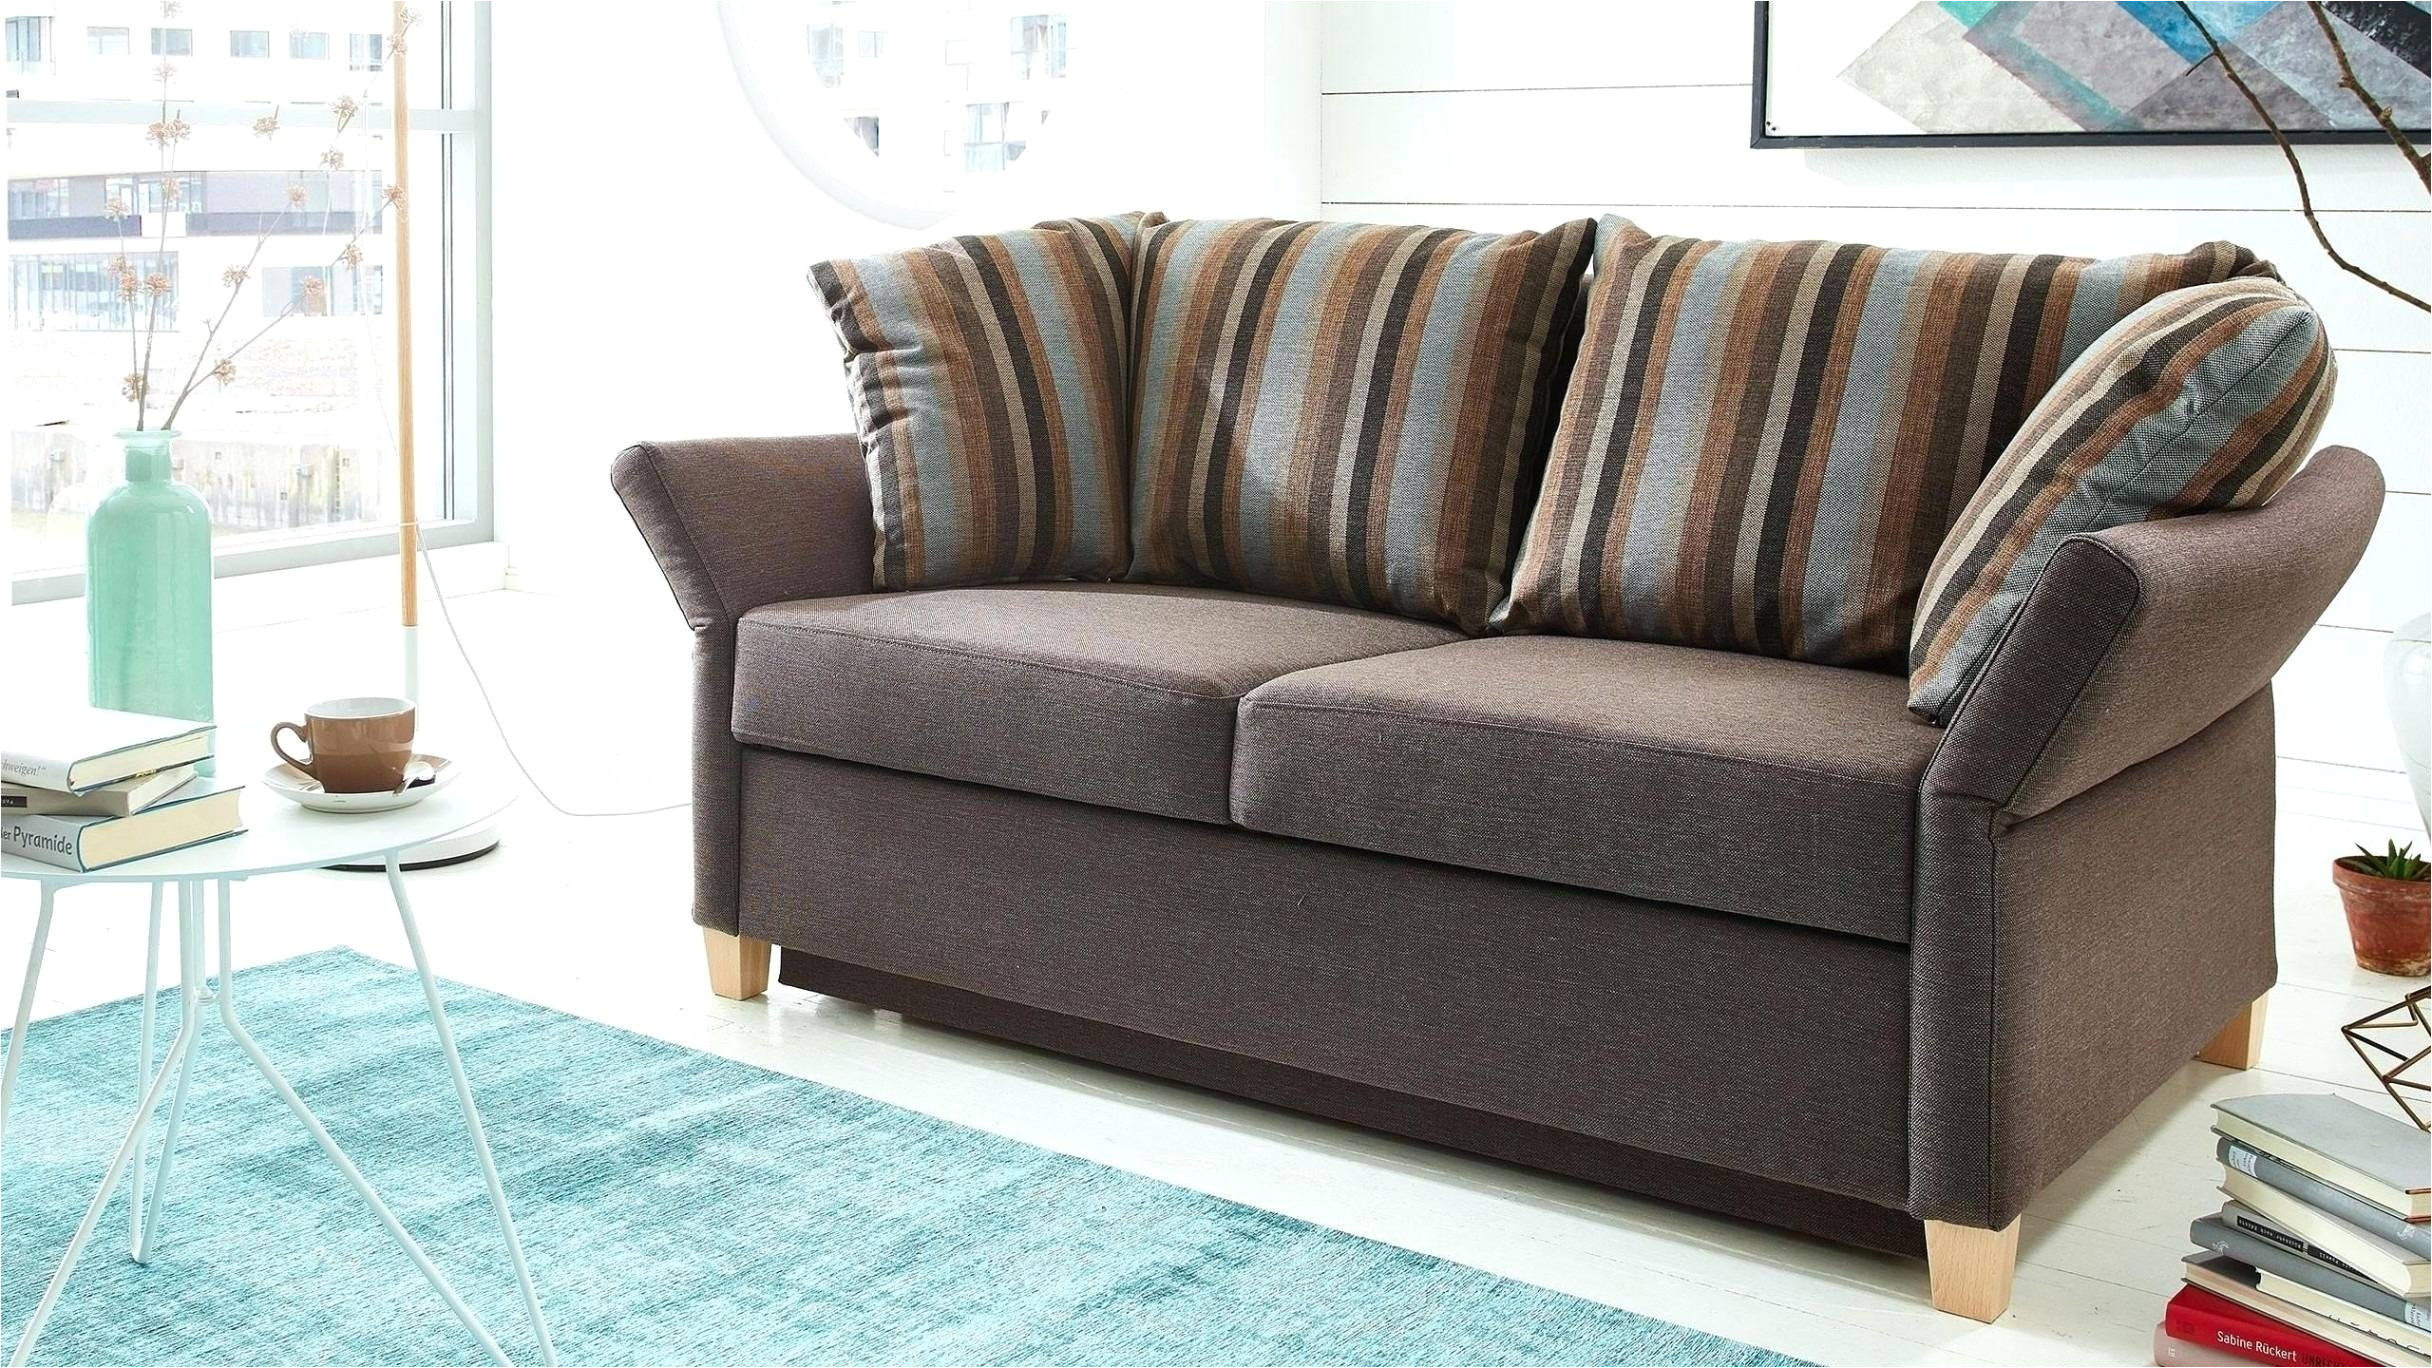 diy schlafsofa frisch wohnzimmer sofa inspirierend sofa shop fresh altes sofa entsorgen sammlung of diy schlafsofa